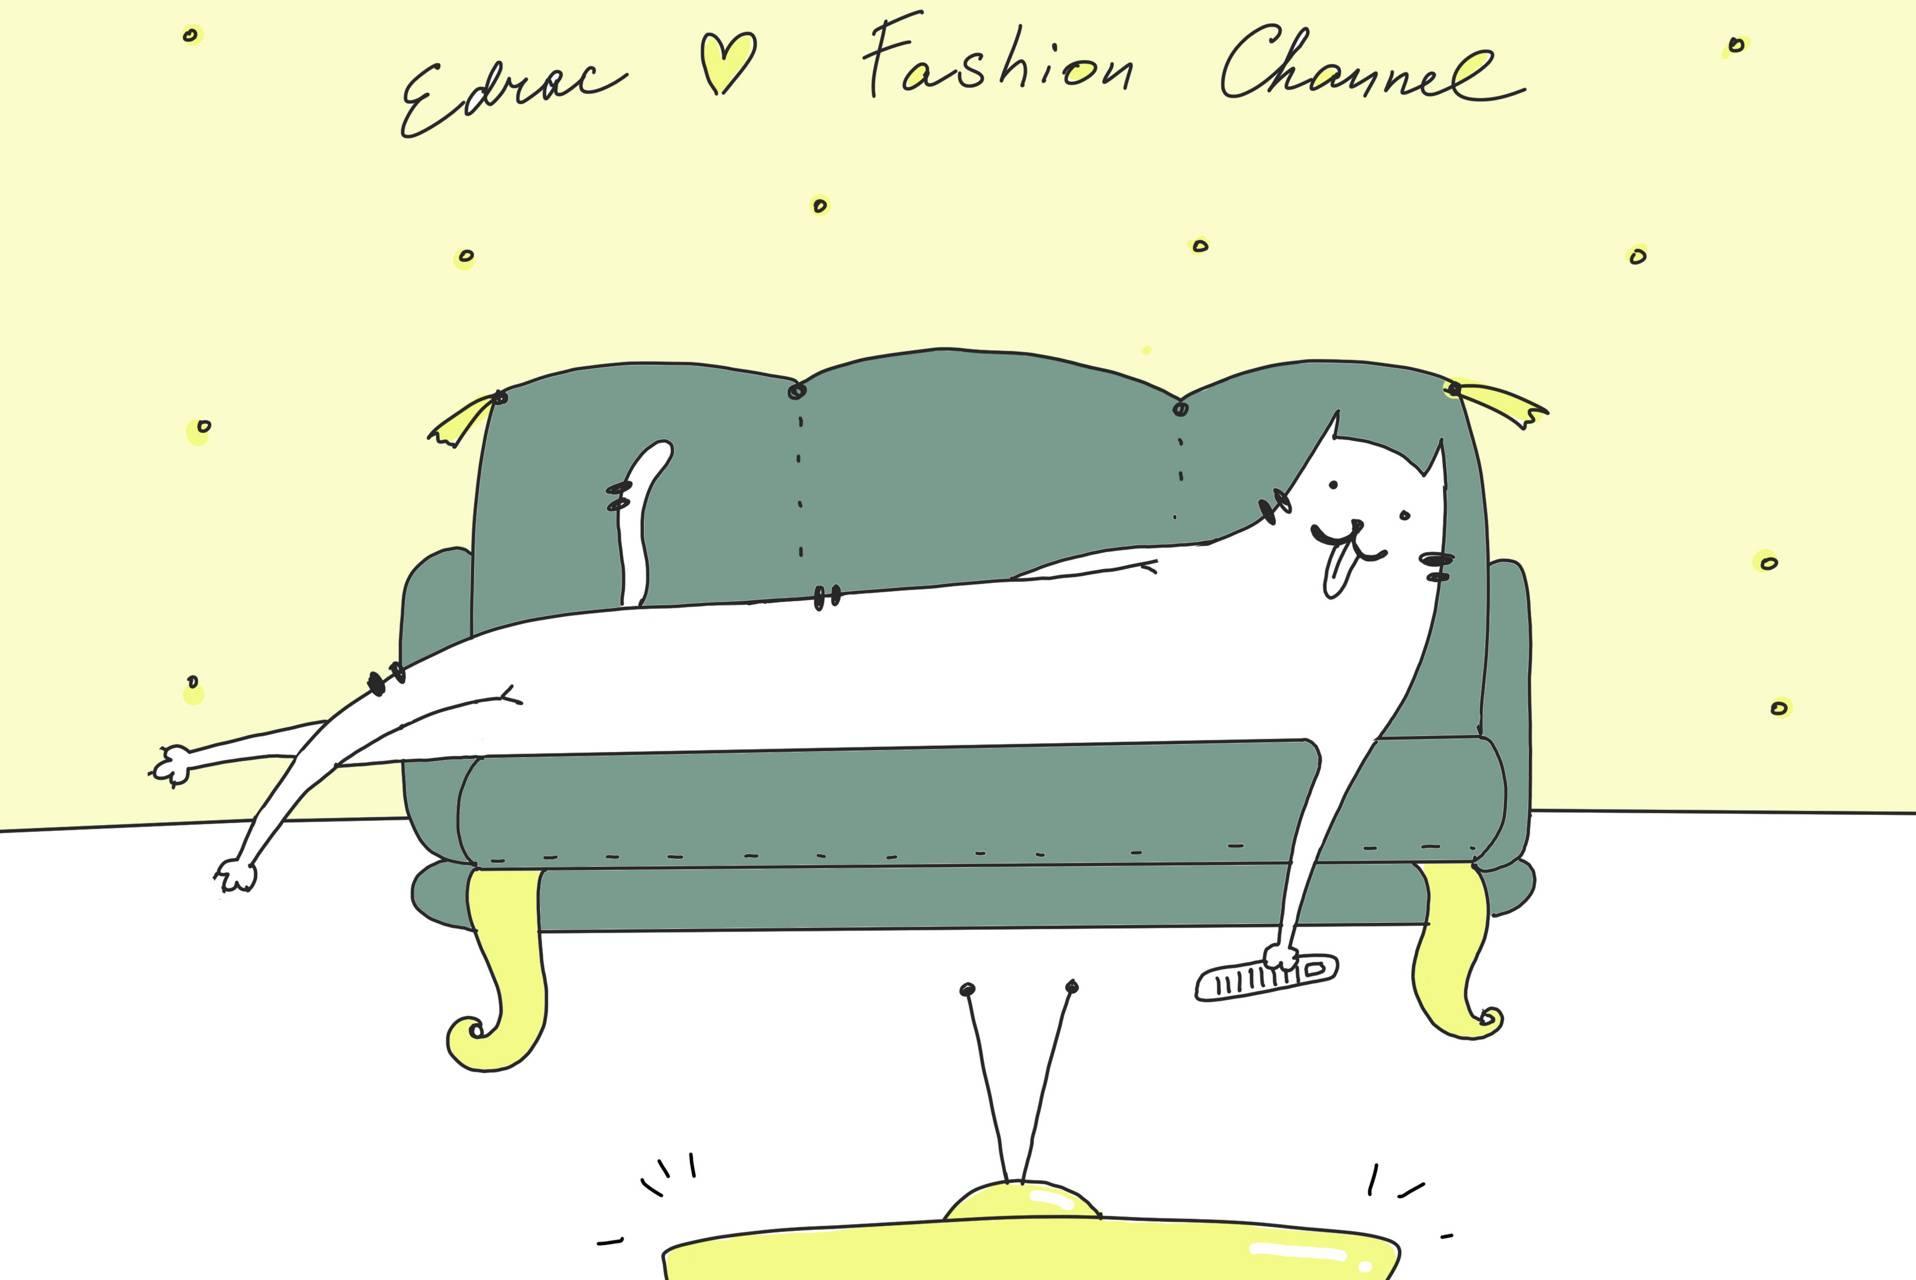 Edrac loves fashion